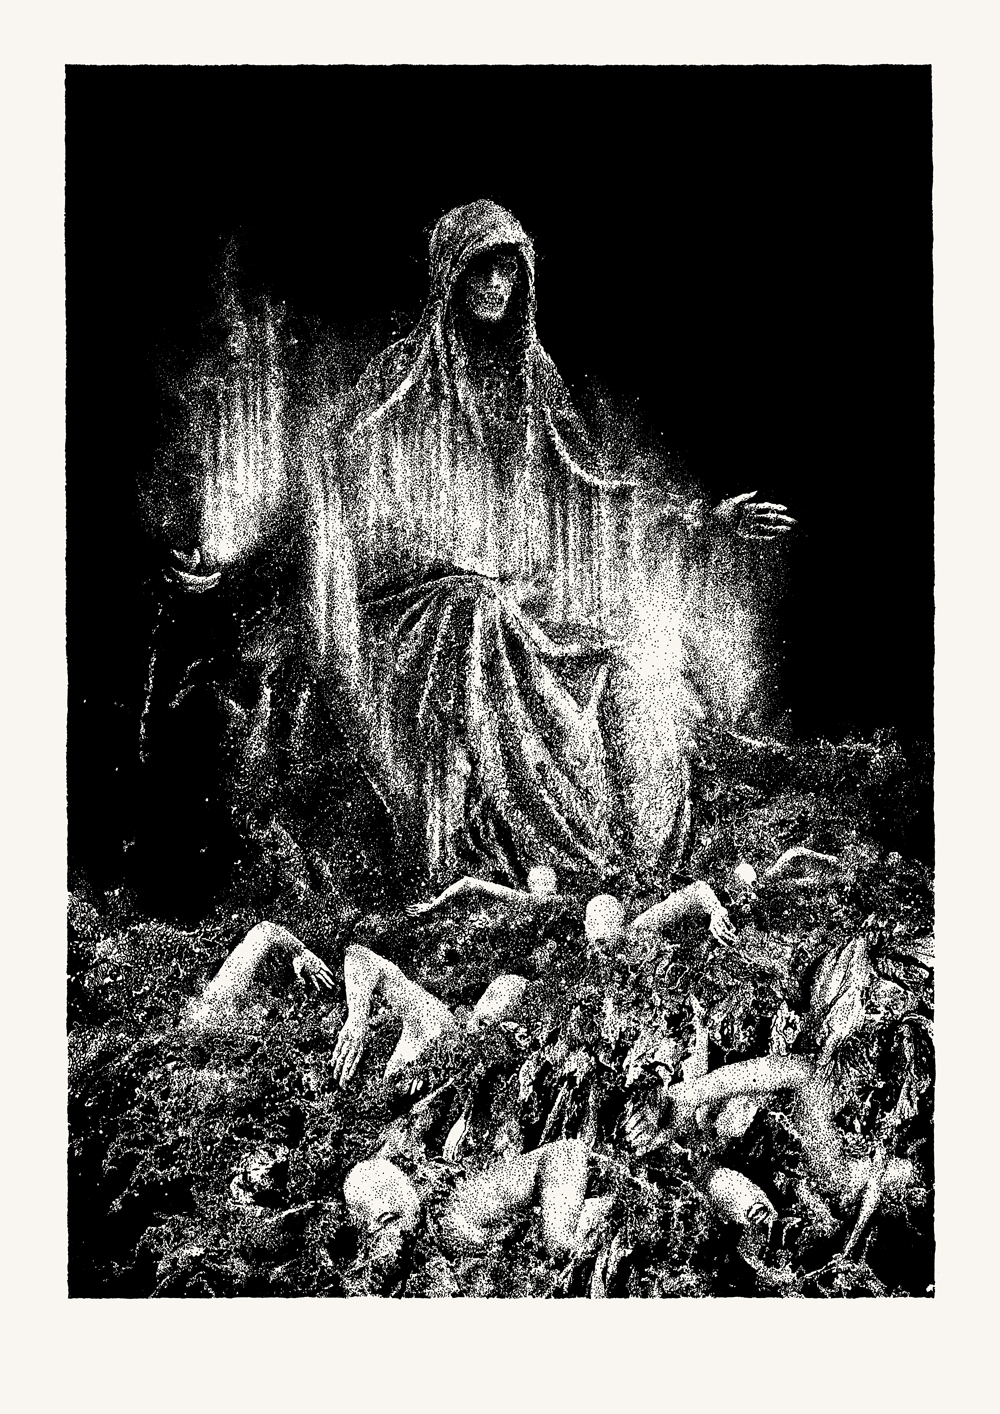 •  Pieta Della Sorte Avversa  (2018), ink on paper, 180 x 260 mm